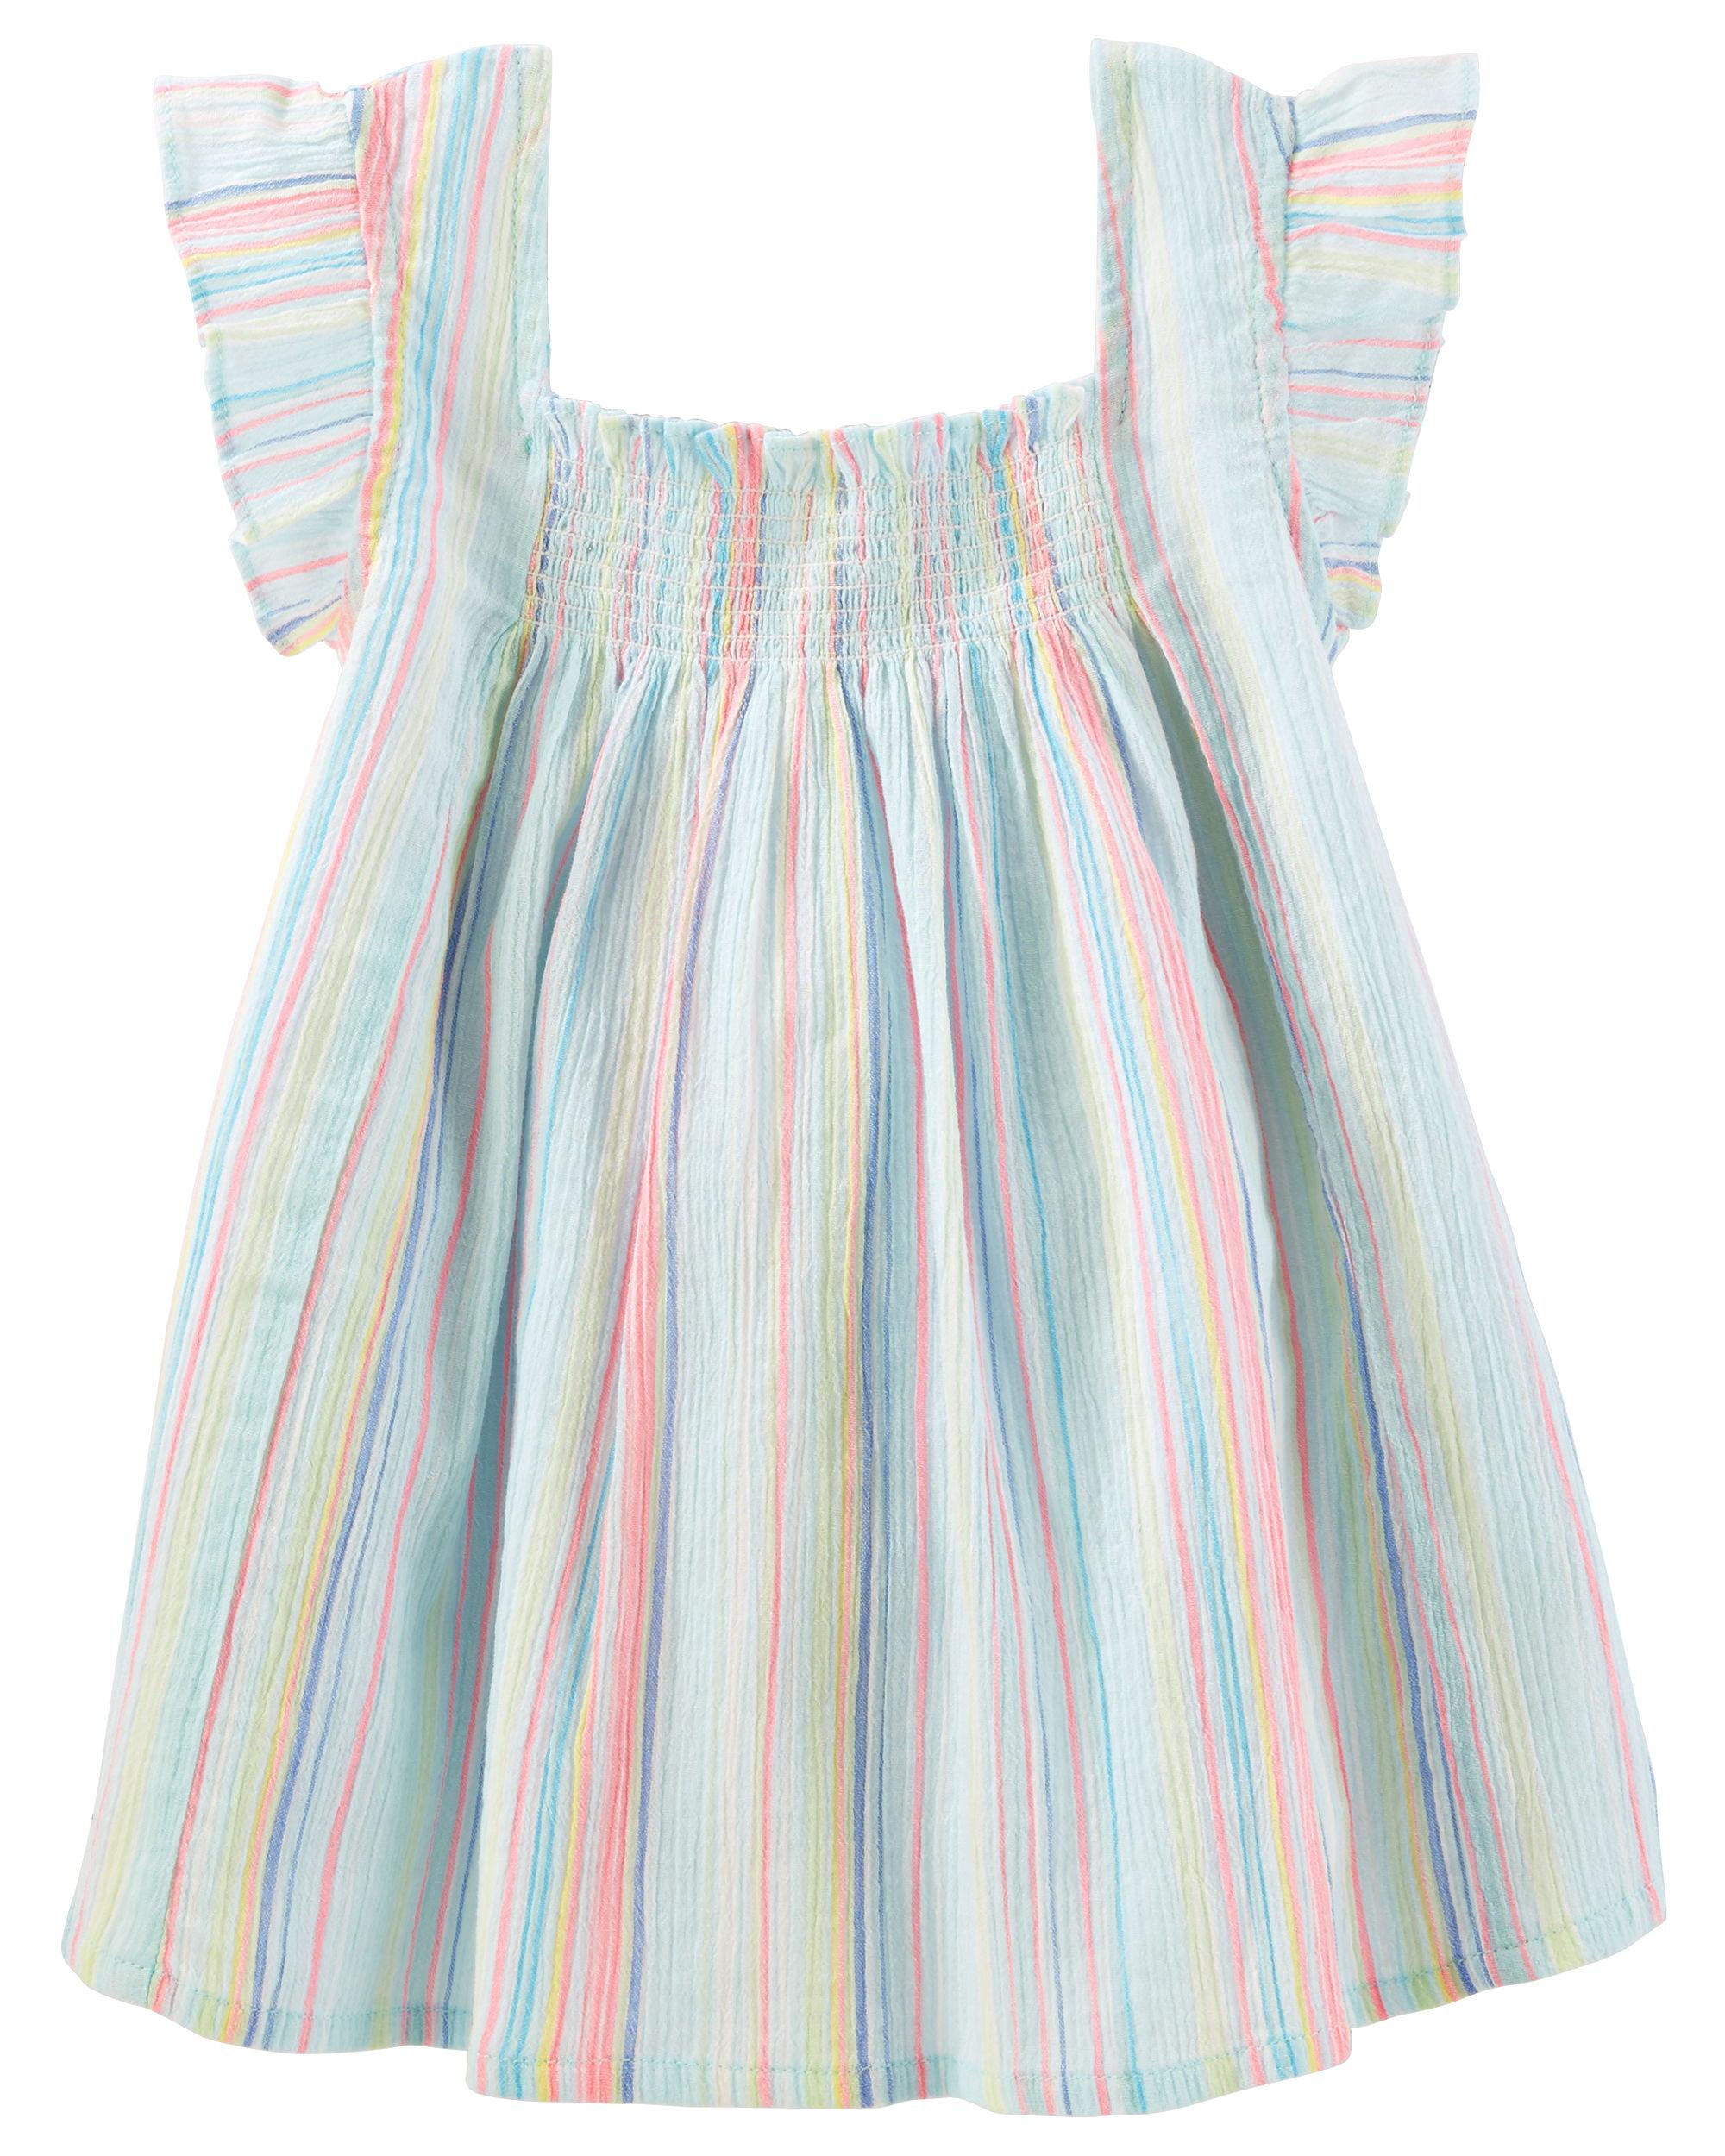 OshKosh B'gosh Big Girls' Smocked Stripe Top, 7-Kids